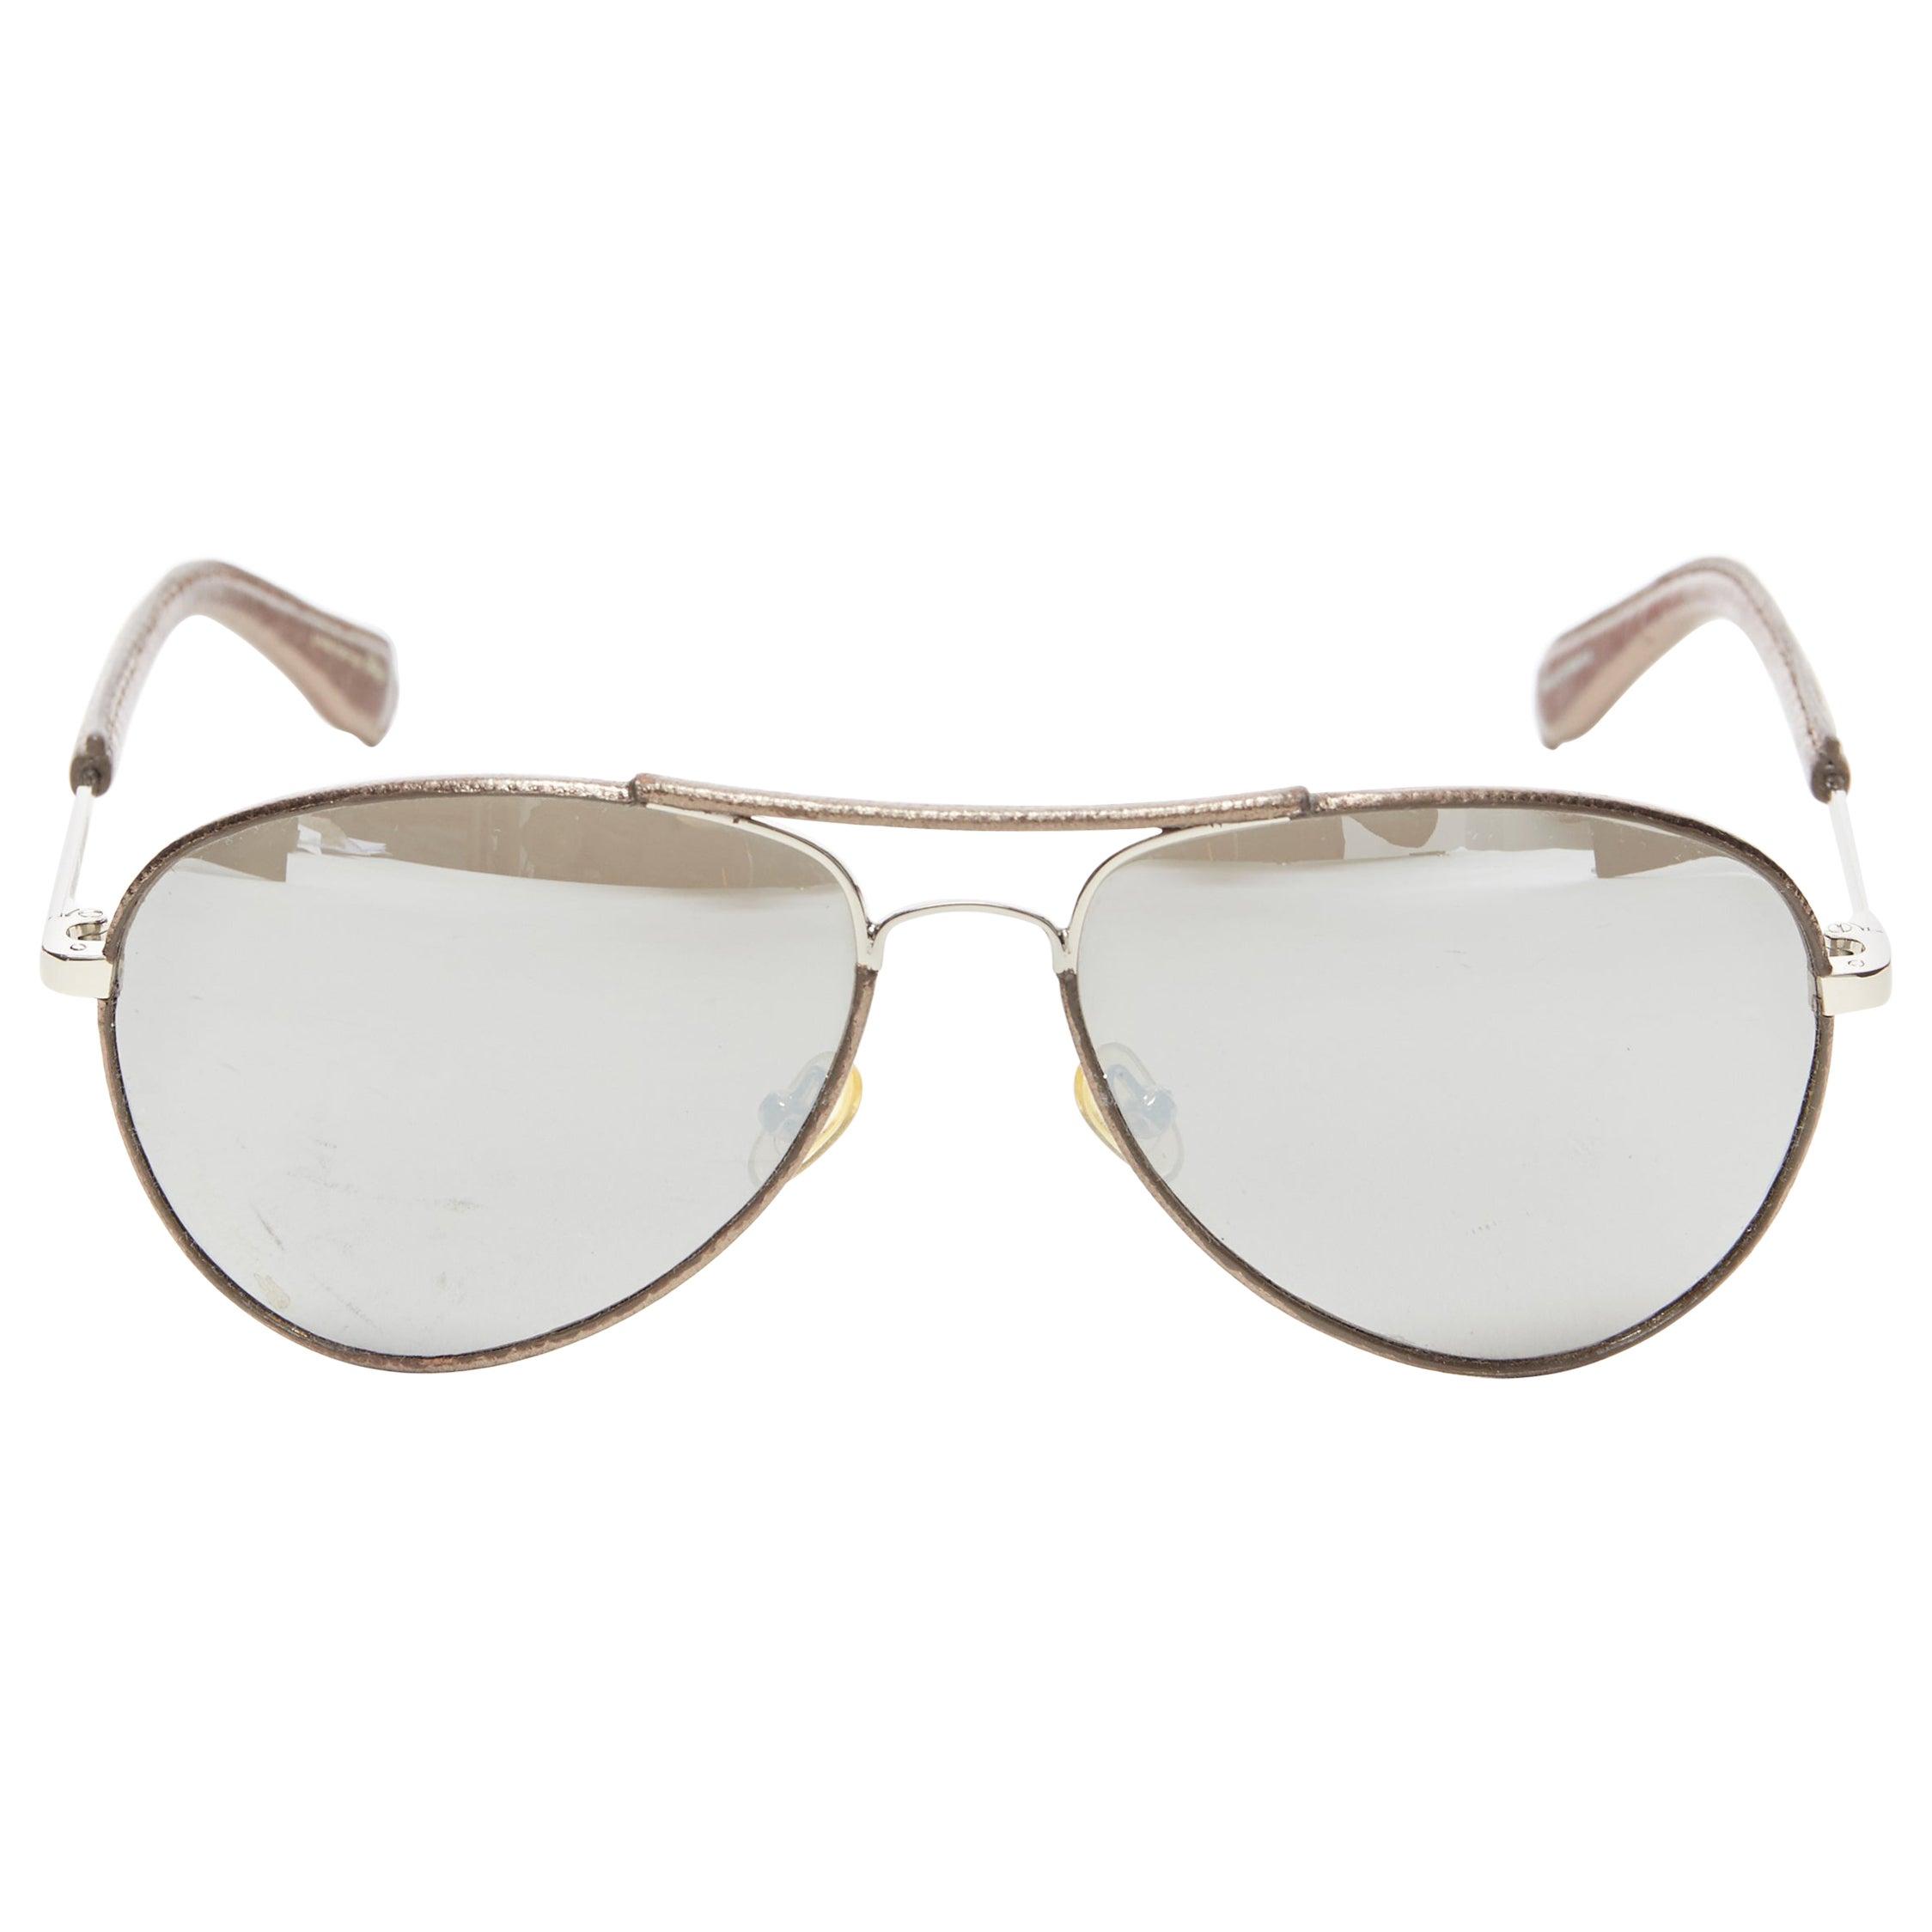 VERONIQUE BRANQUIHO LINDA FARROW copper leather mirrored aviator sunglasses